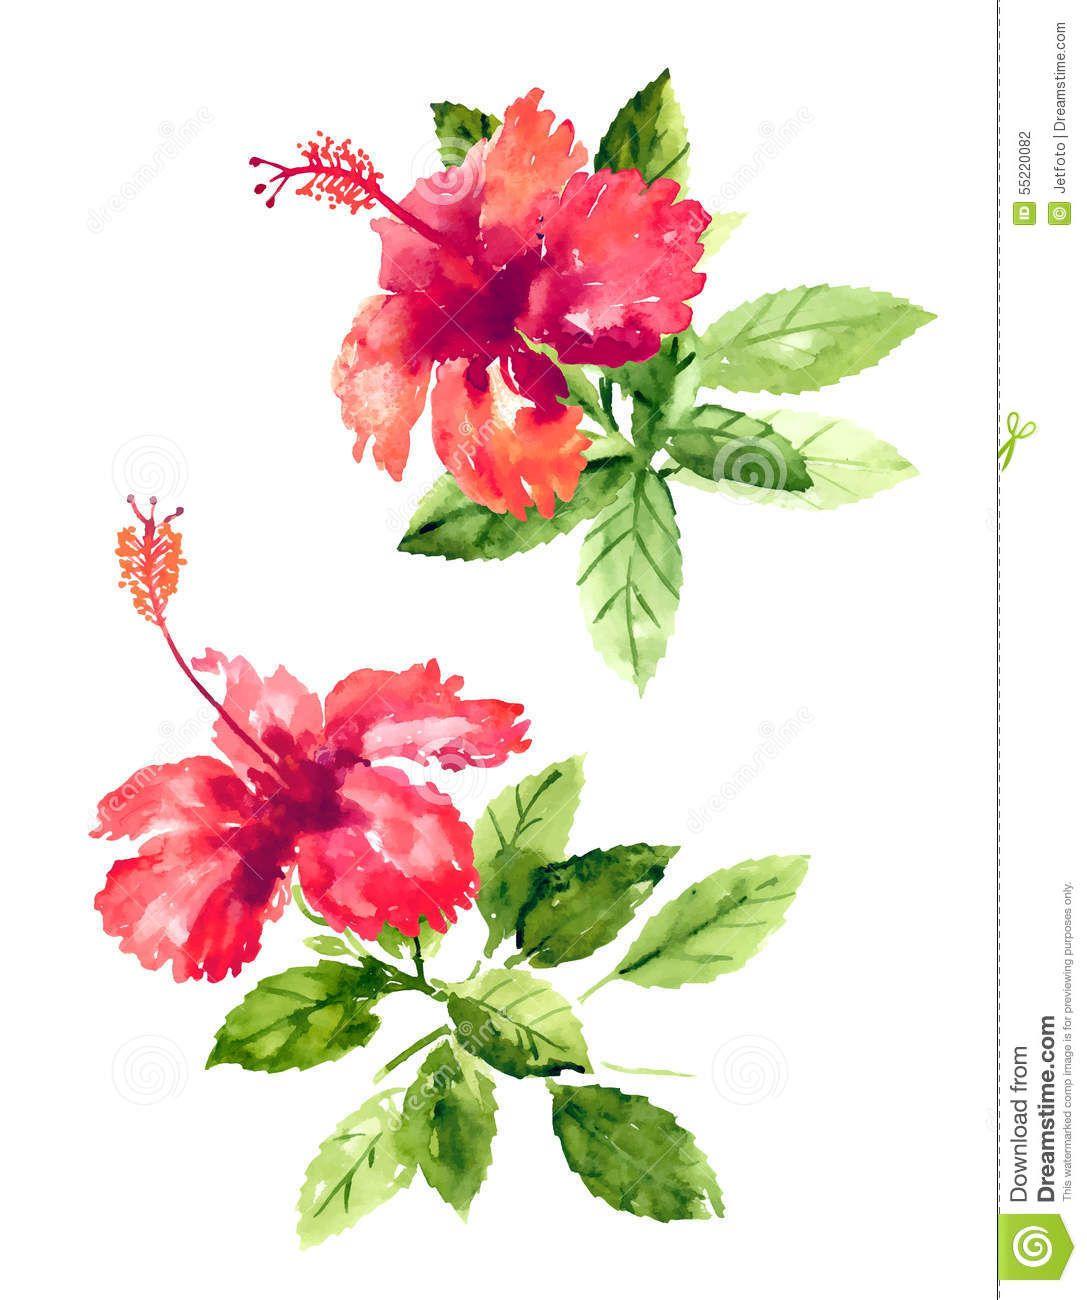 Collection of watercolor hibiscus flowers download from over 33 collection of watercolor hibiscus flowers download from over 33 million high quality stock photos izmirmasajfo